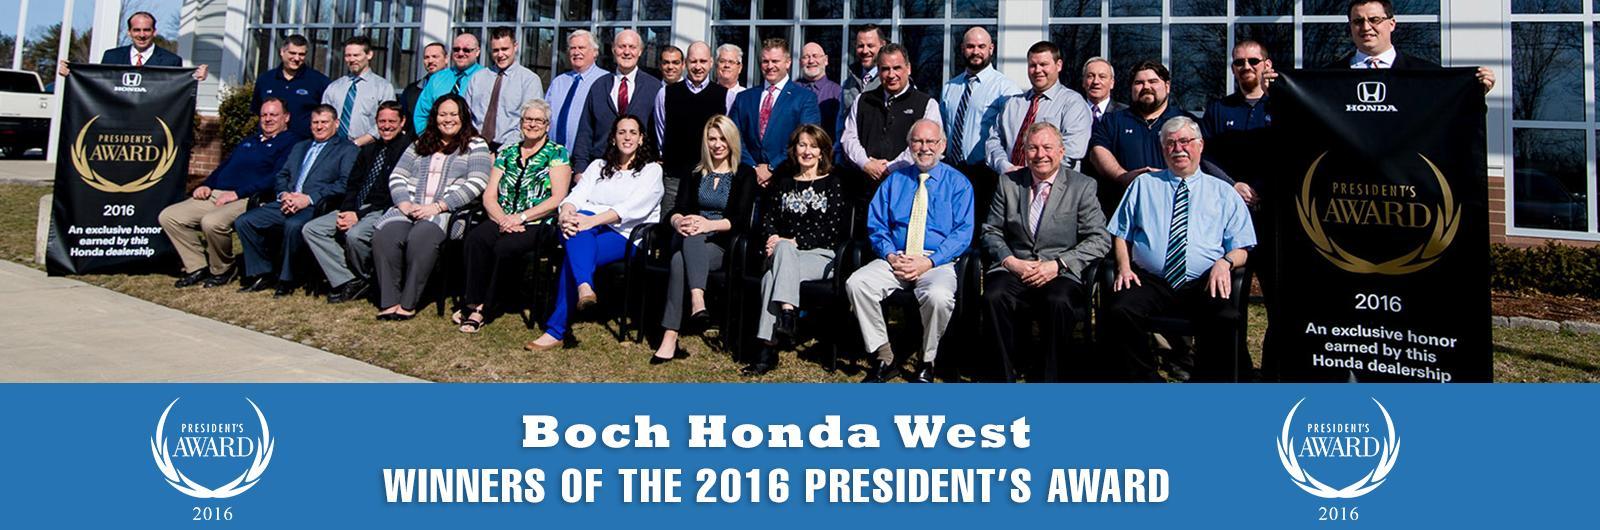 Boch Honda West >> Boch Honda West | MA Honda Dealer Near Lowell